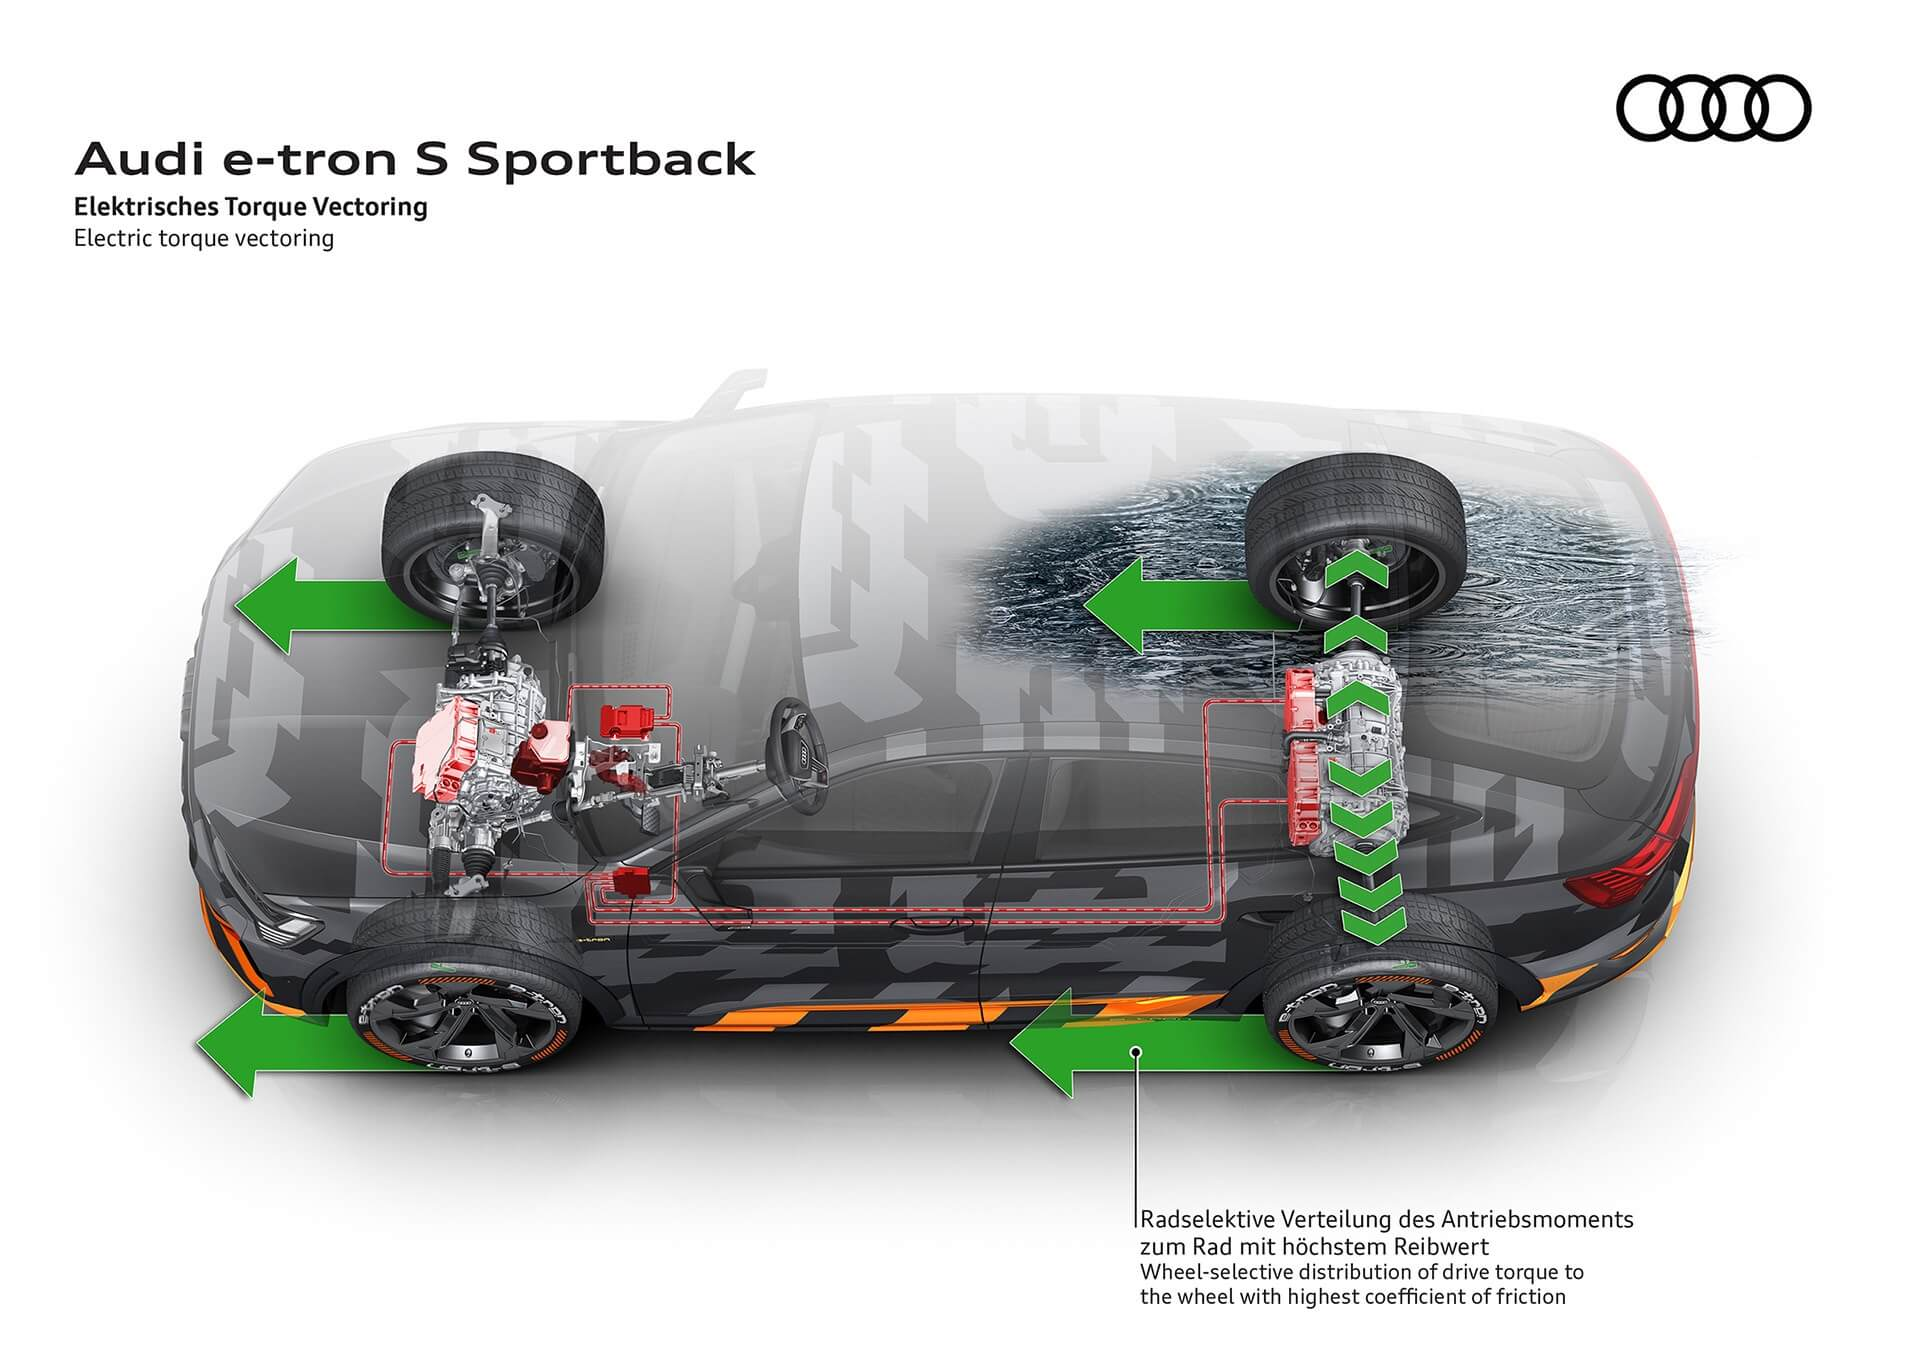 Audi e-tron S Sportback - Ηλεκτρική κατανομή ροπής